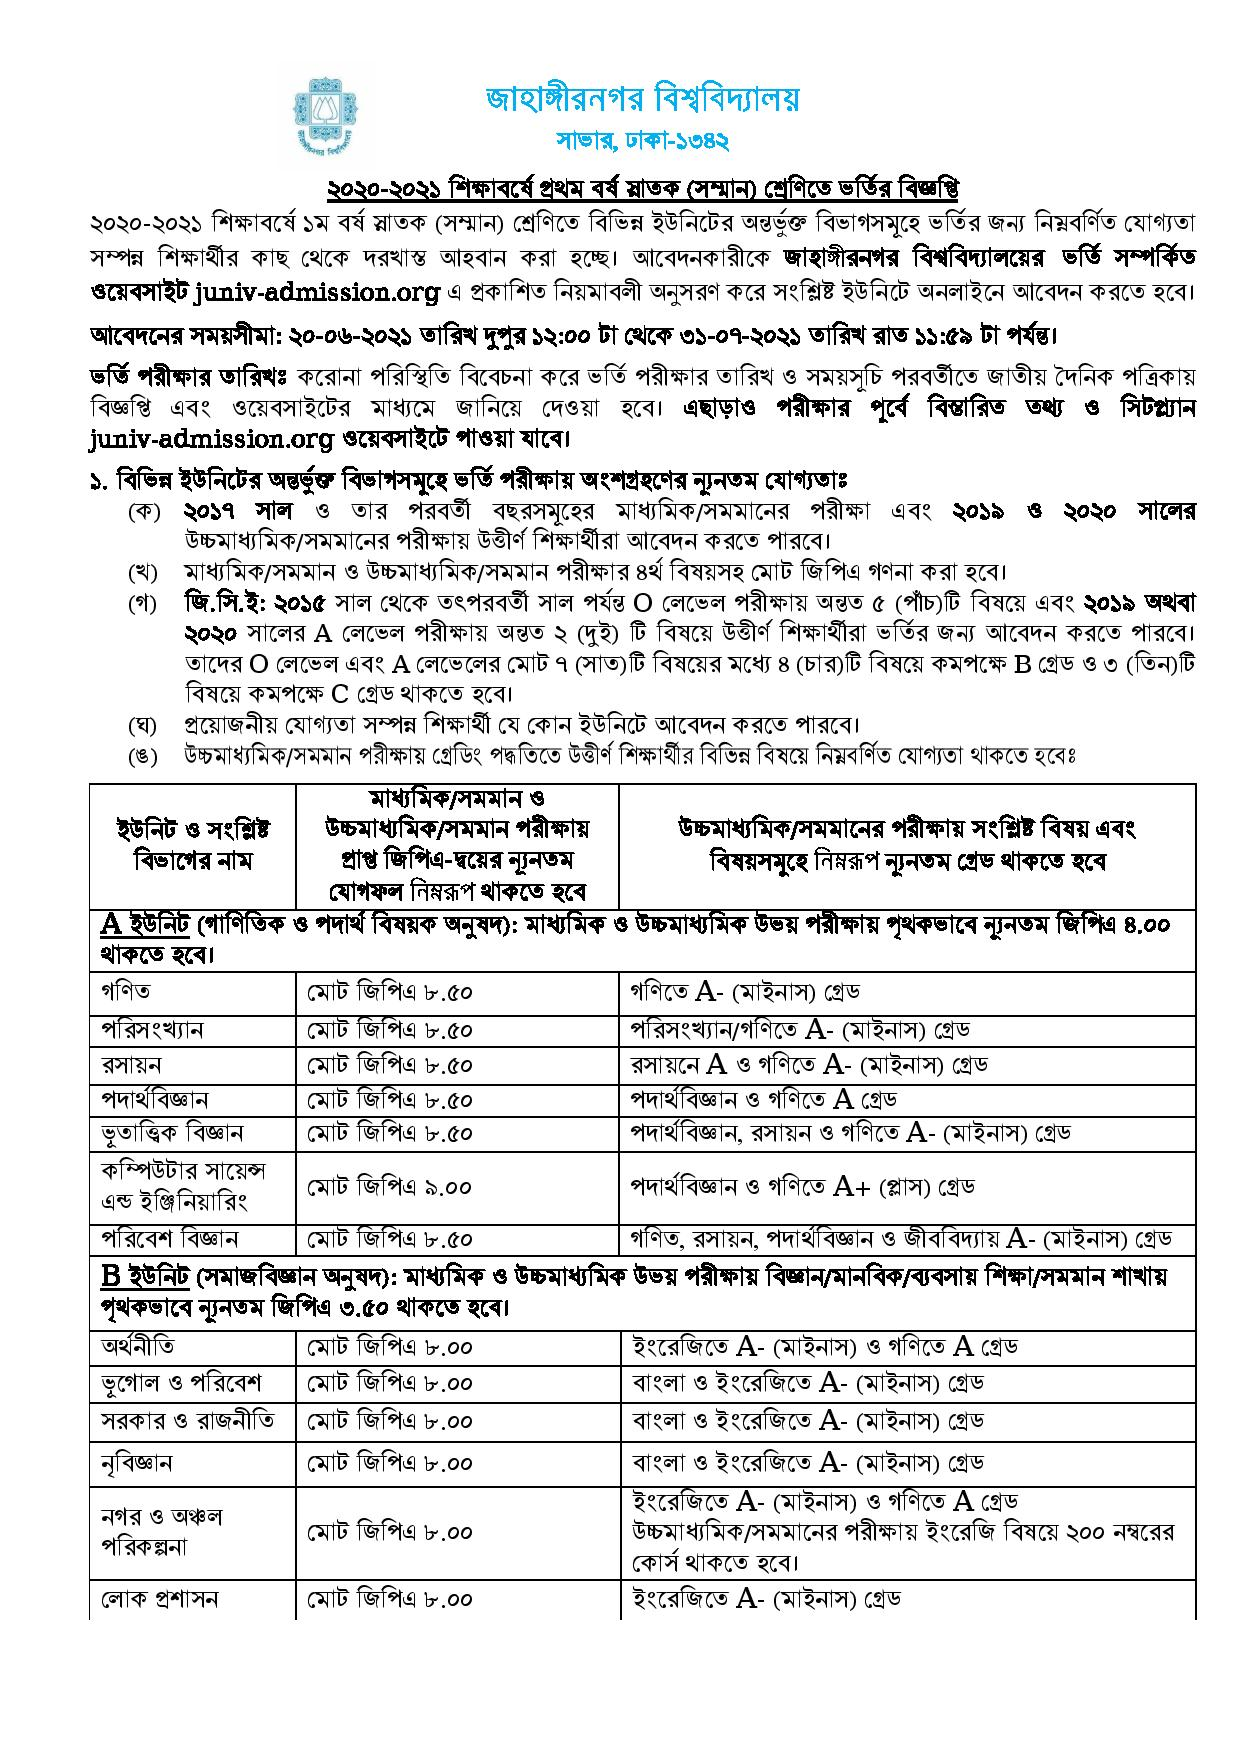 JU-Admission-2020-21-page-001